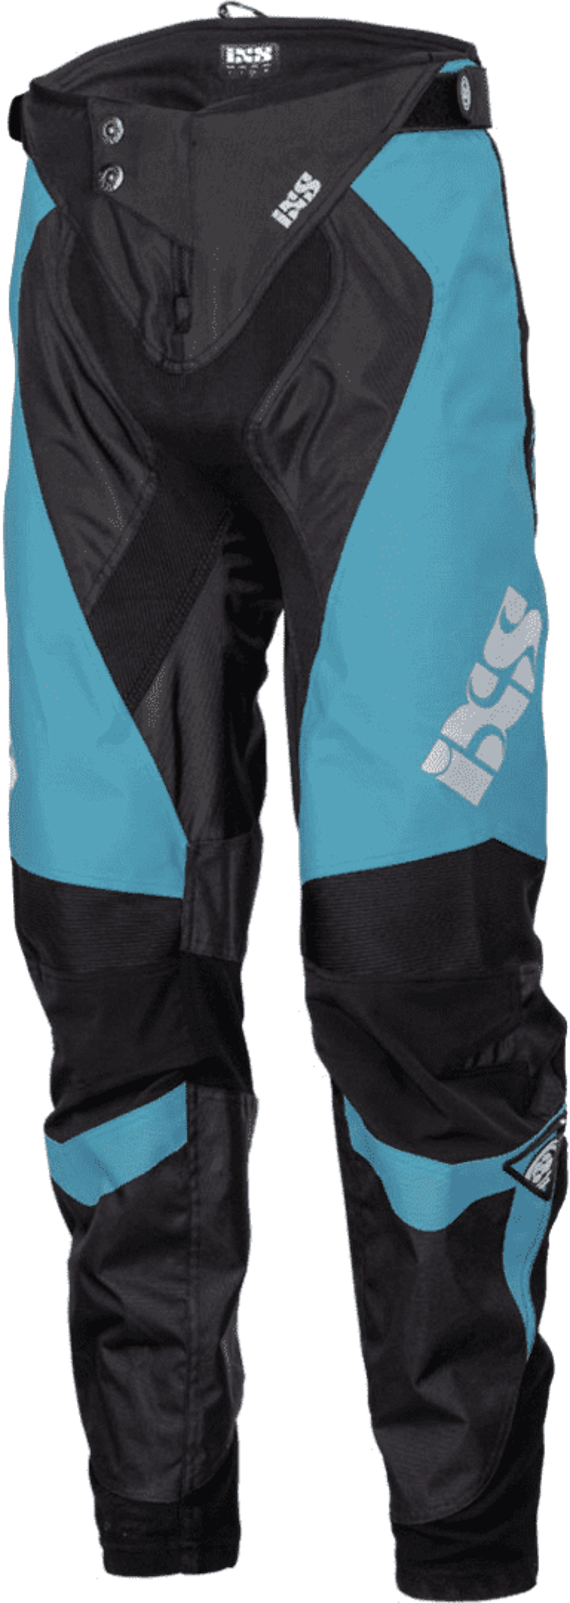 IXS Race 7.1 DH Shorts Hose World Cup-Edition, M, Neu